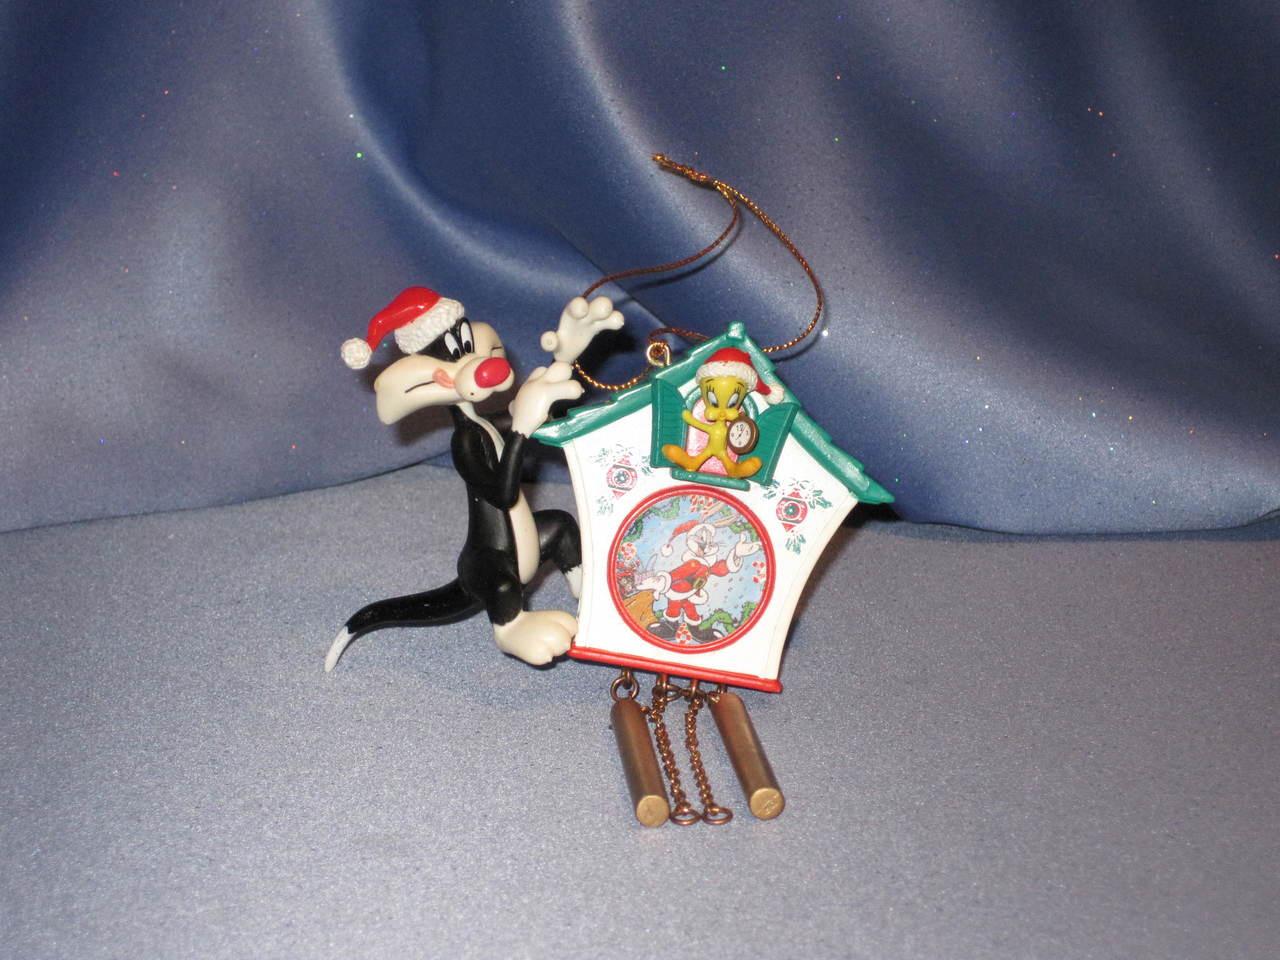 Looney Tunes Sylvester & Tweety Ornament.